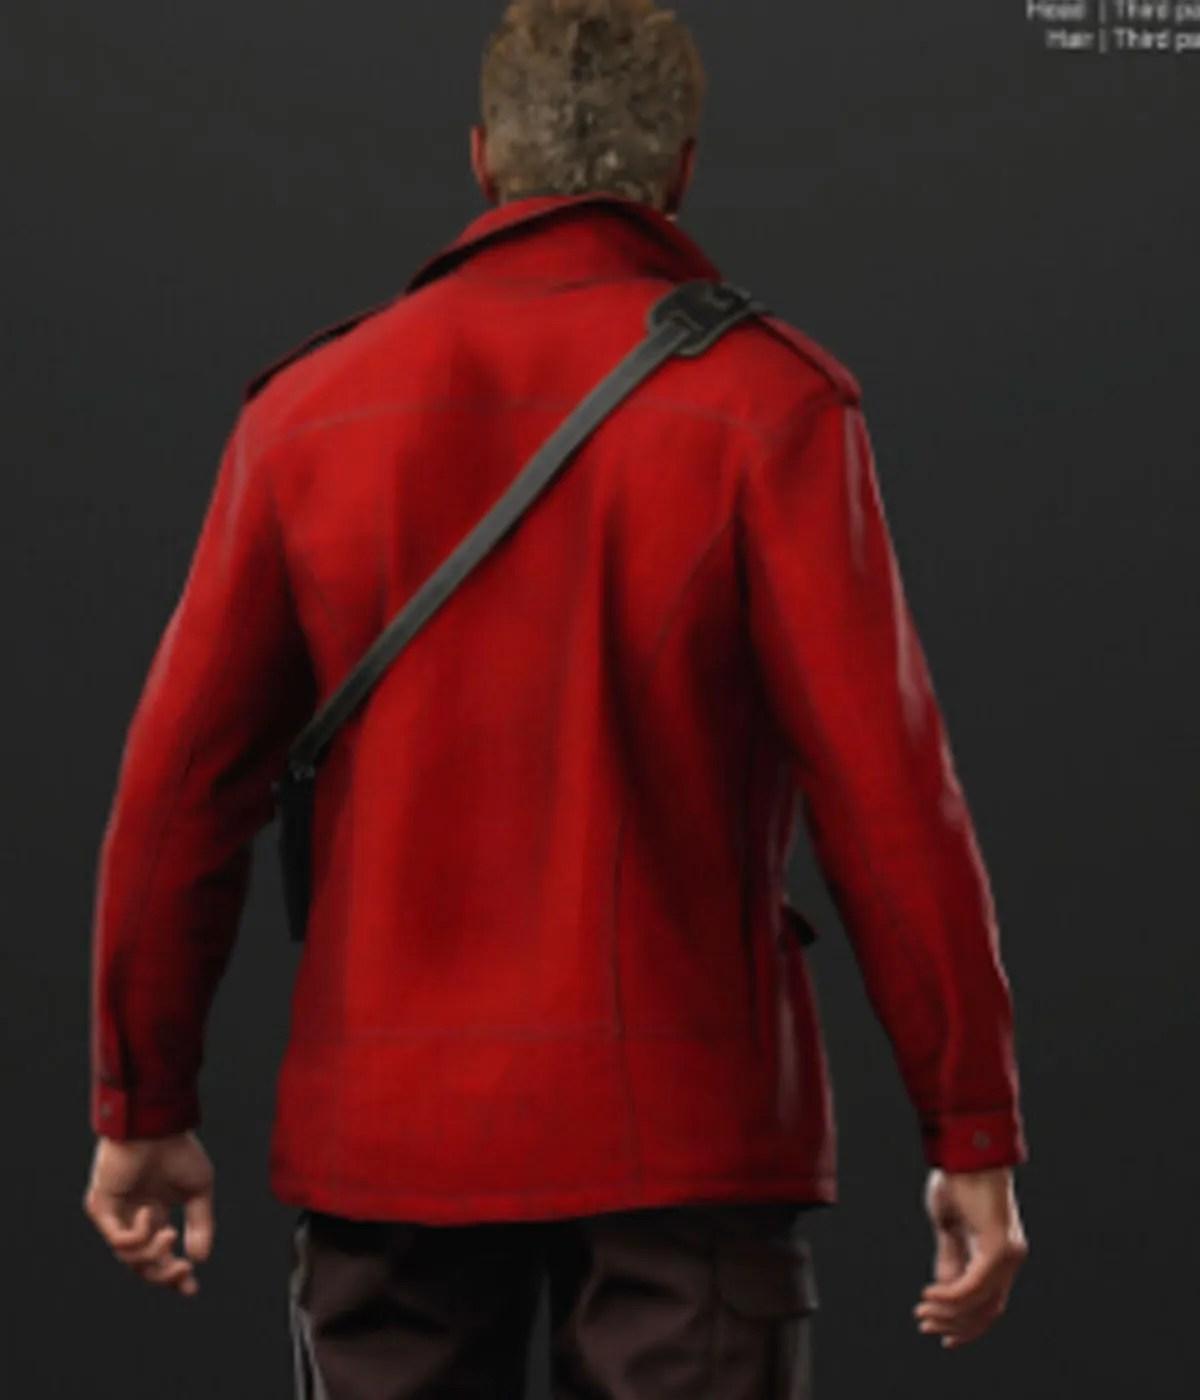 avengers-hank-pym-red-jacket